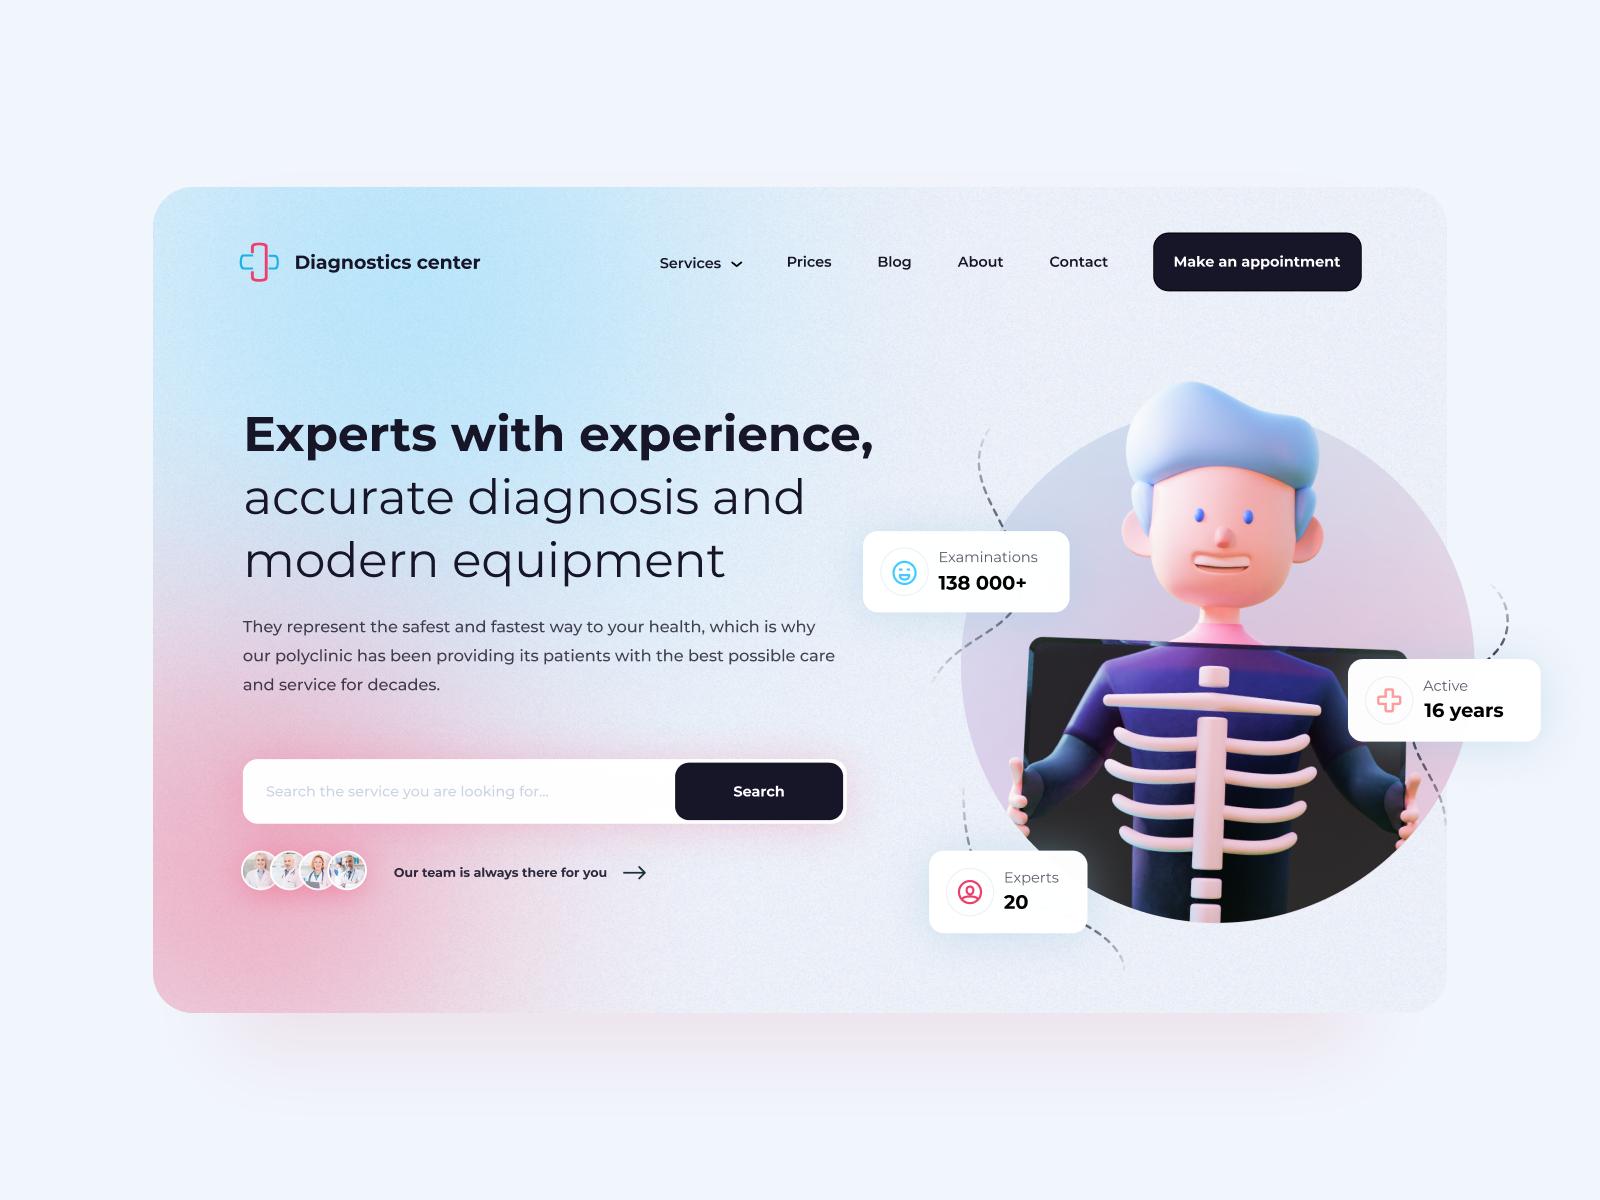 Web design inspiration: landing page by Jovana Peric